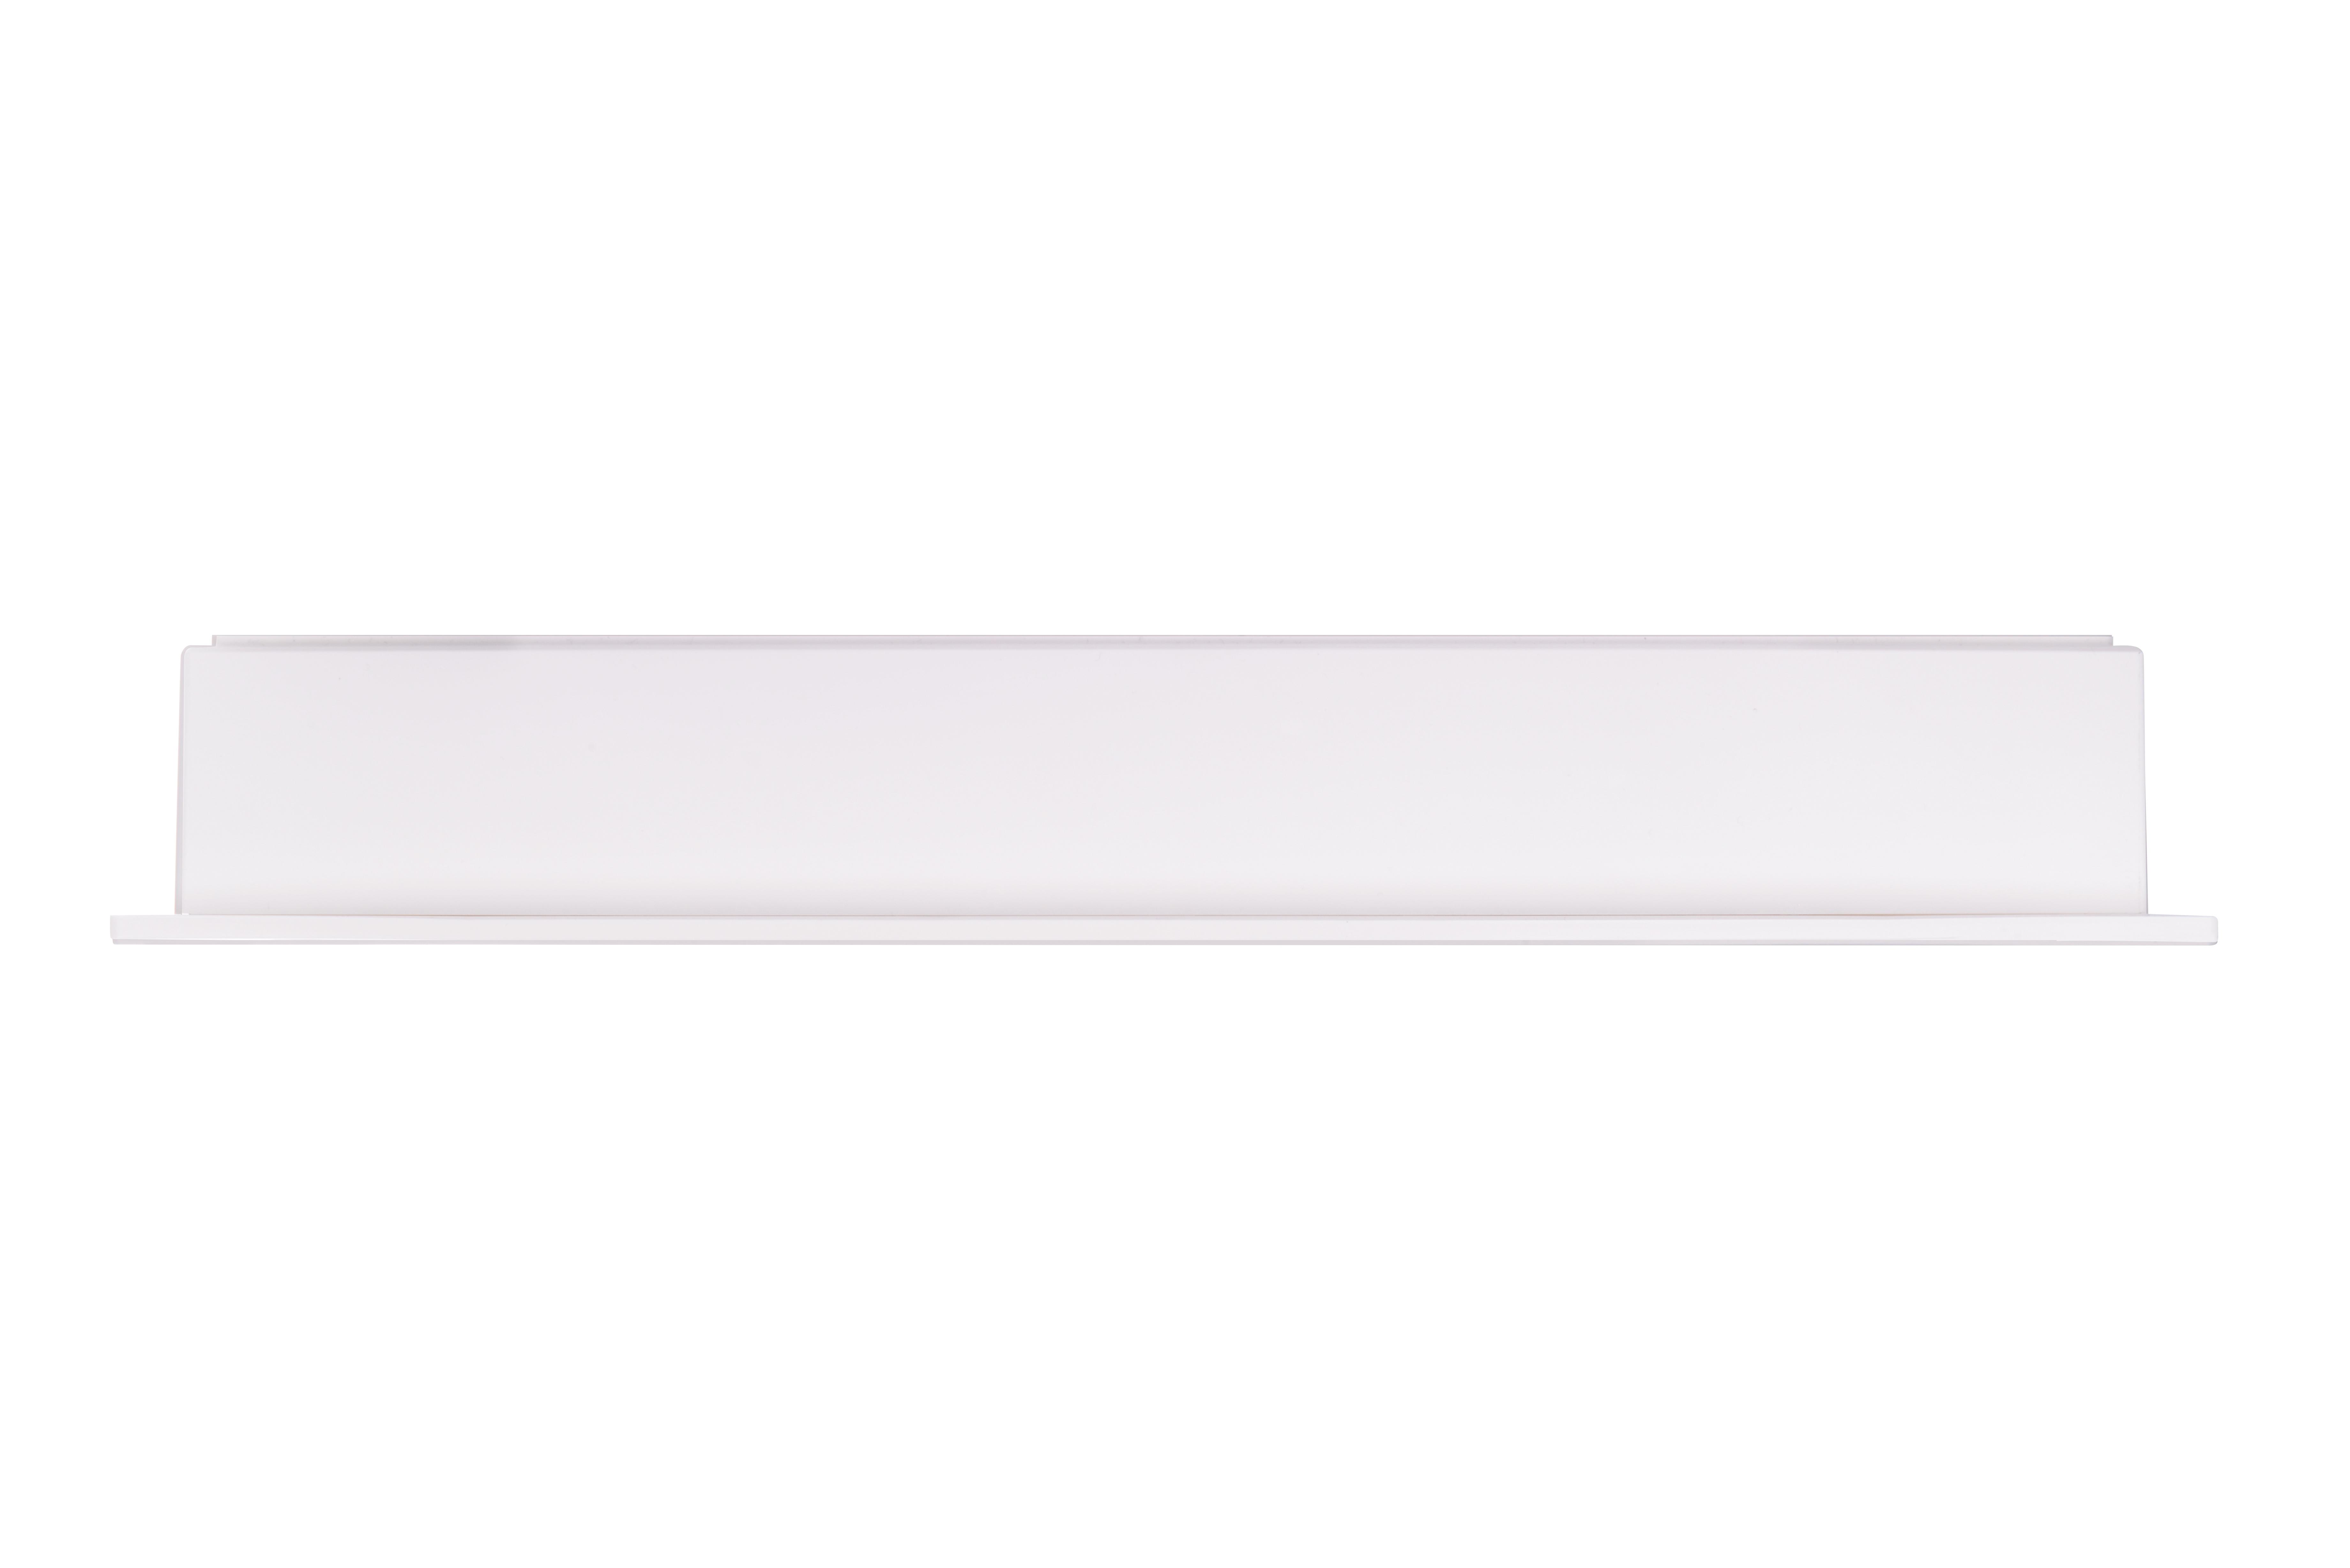 Lampa emergenta led Intelight 94719   3h nementinut test automat5